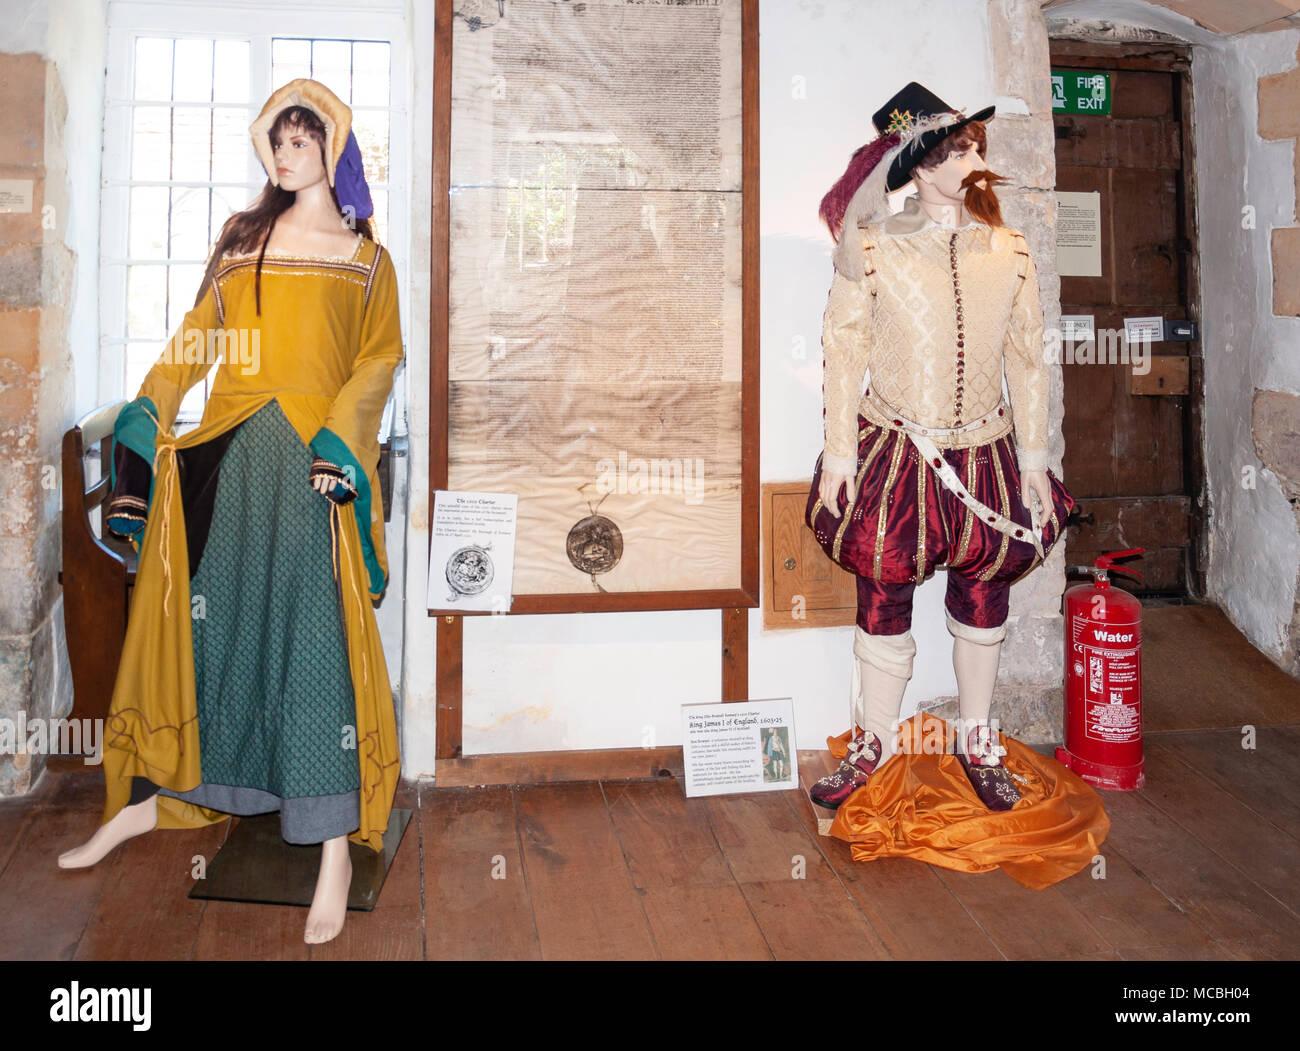 Medieval costume exhbit in King John's House & Tudor Cottage, Church Street, Romsey, Hampshire, England, United Kingdom - Stock Image